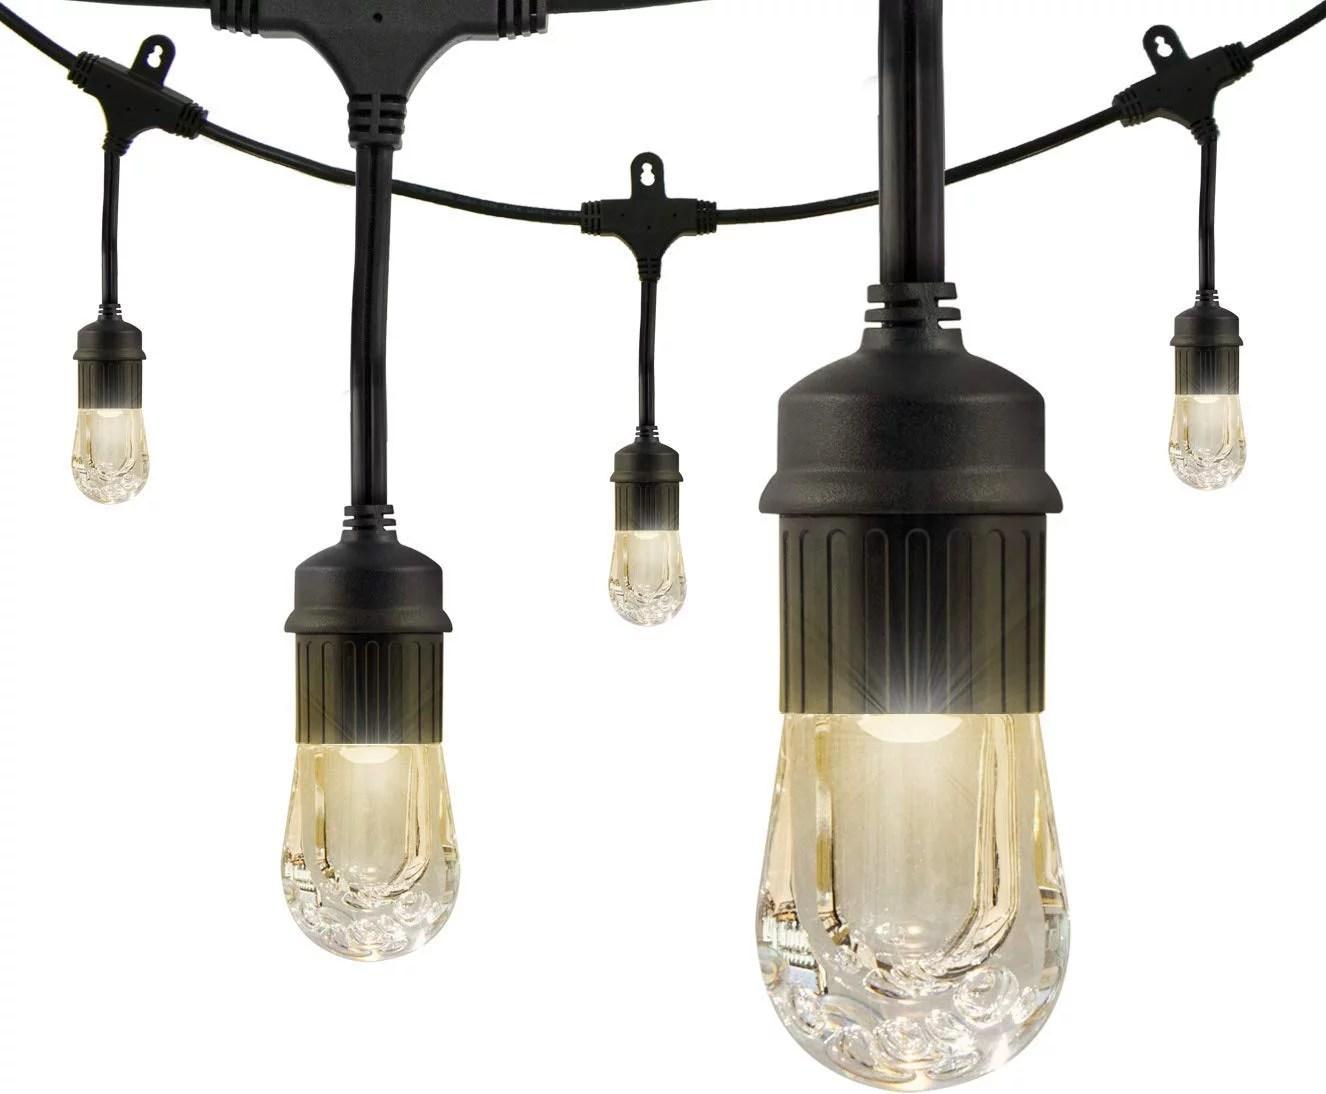 enbrighten classic led cafe string lights 24ft 12 acrylic bulbs indoor outdoor weatherproof shatterproof black cord 31662